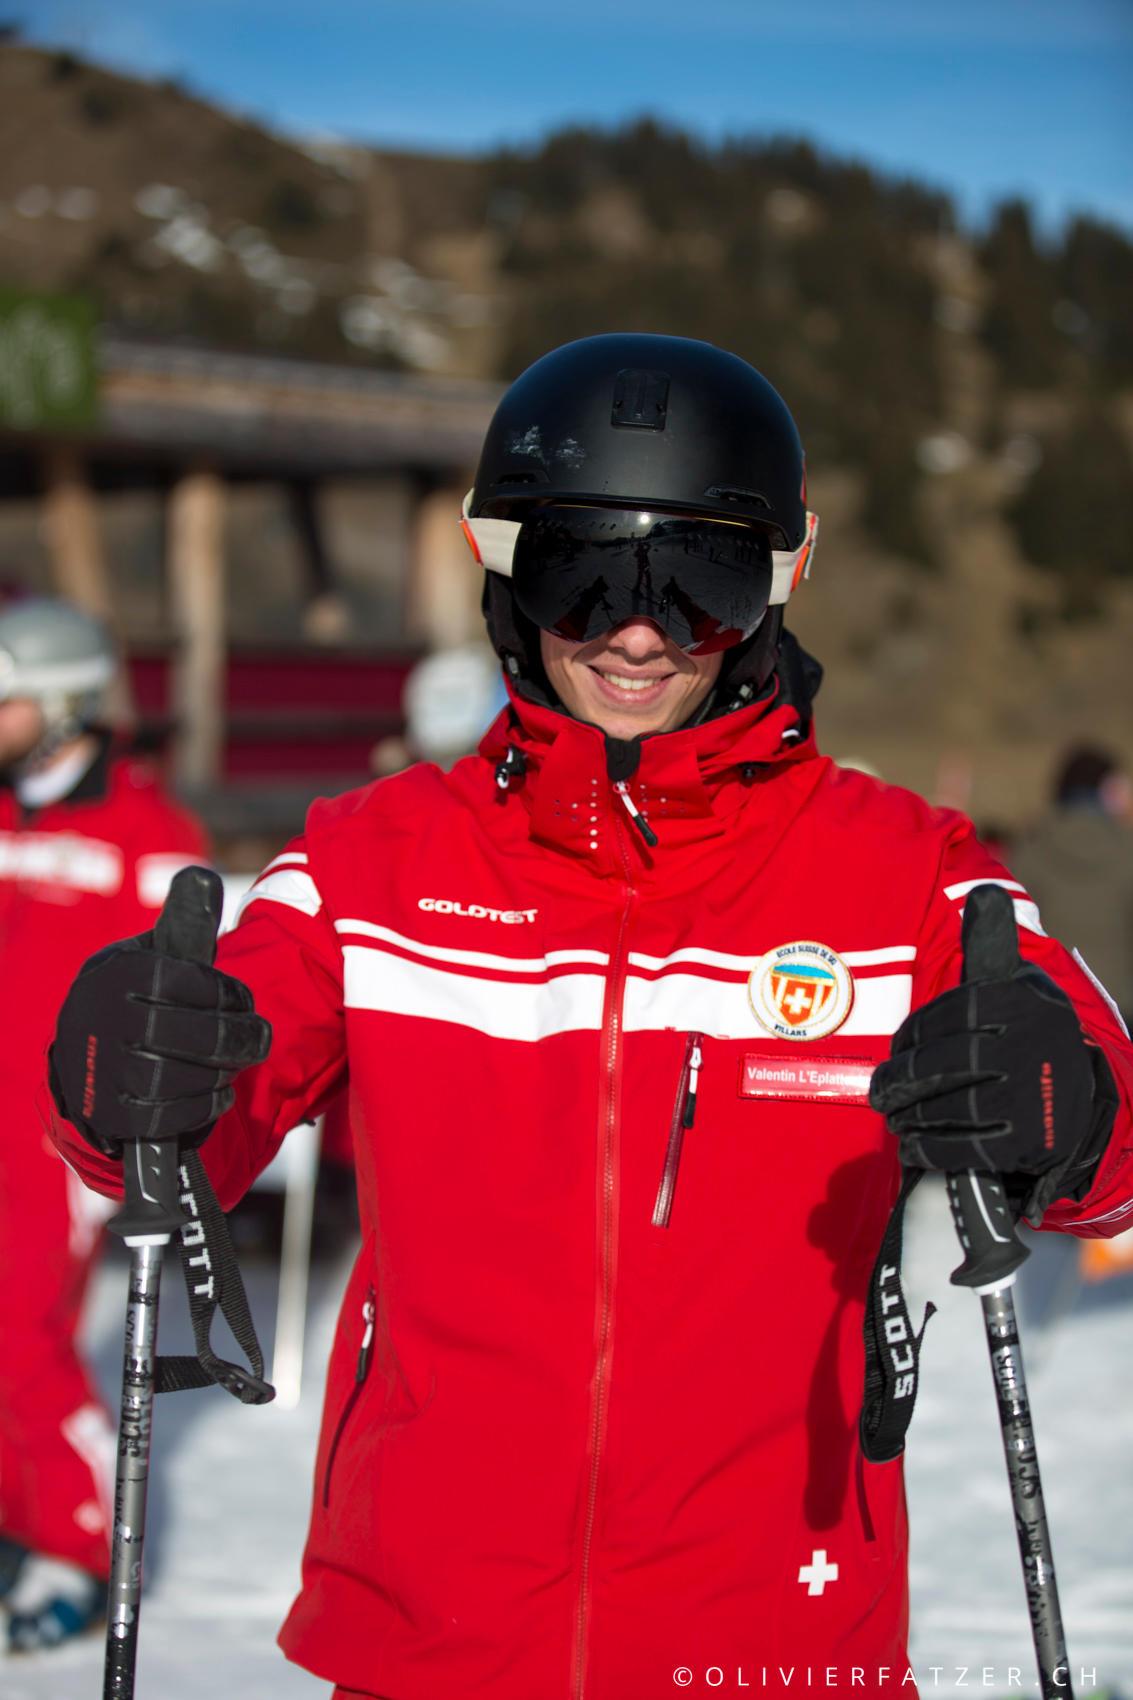 Ecole Suisse de Ski - Villars